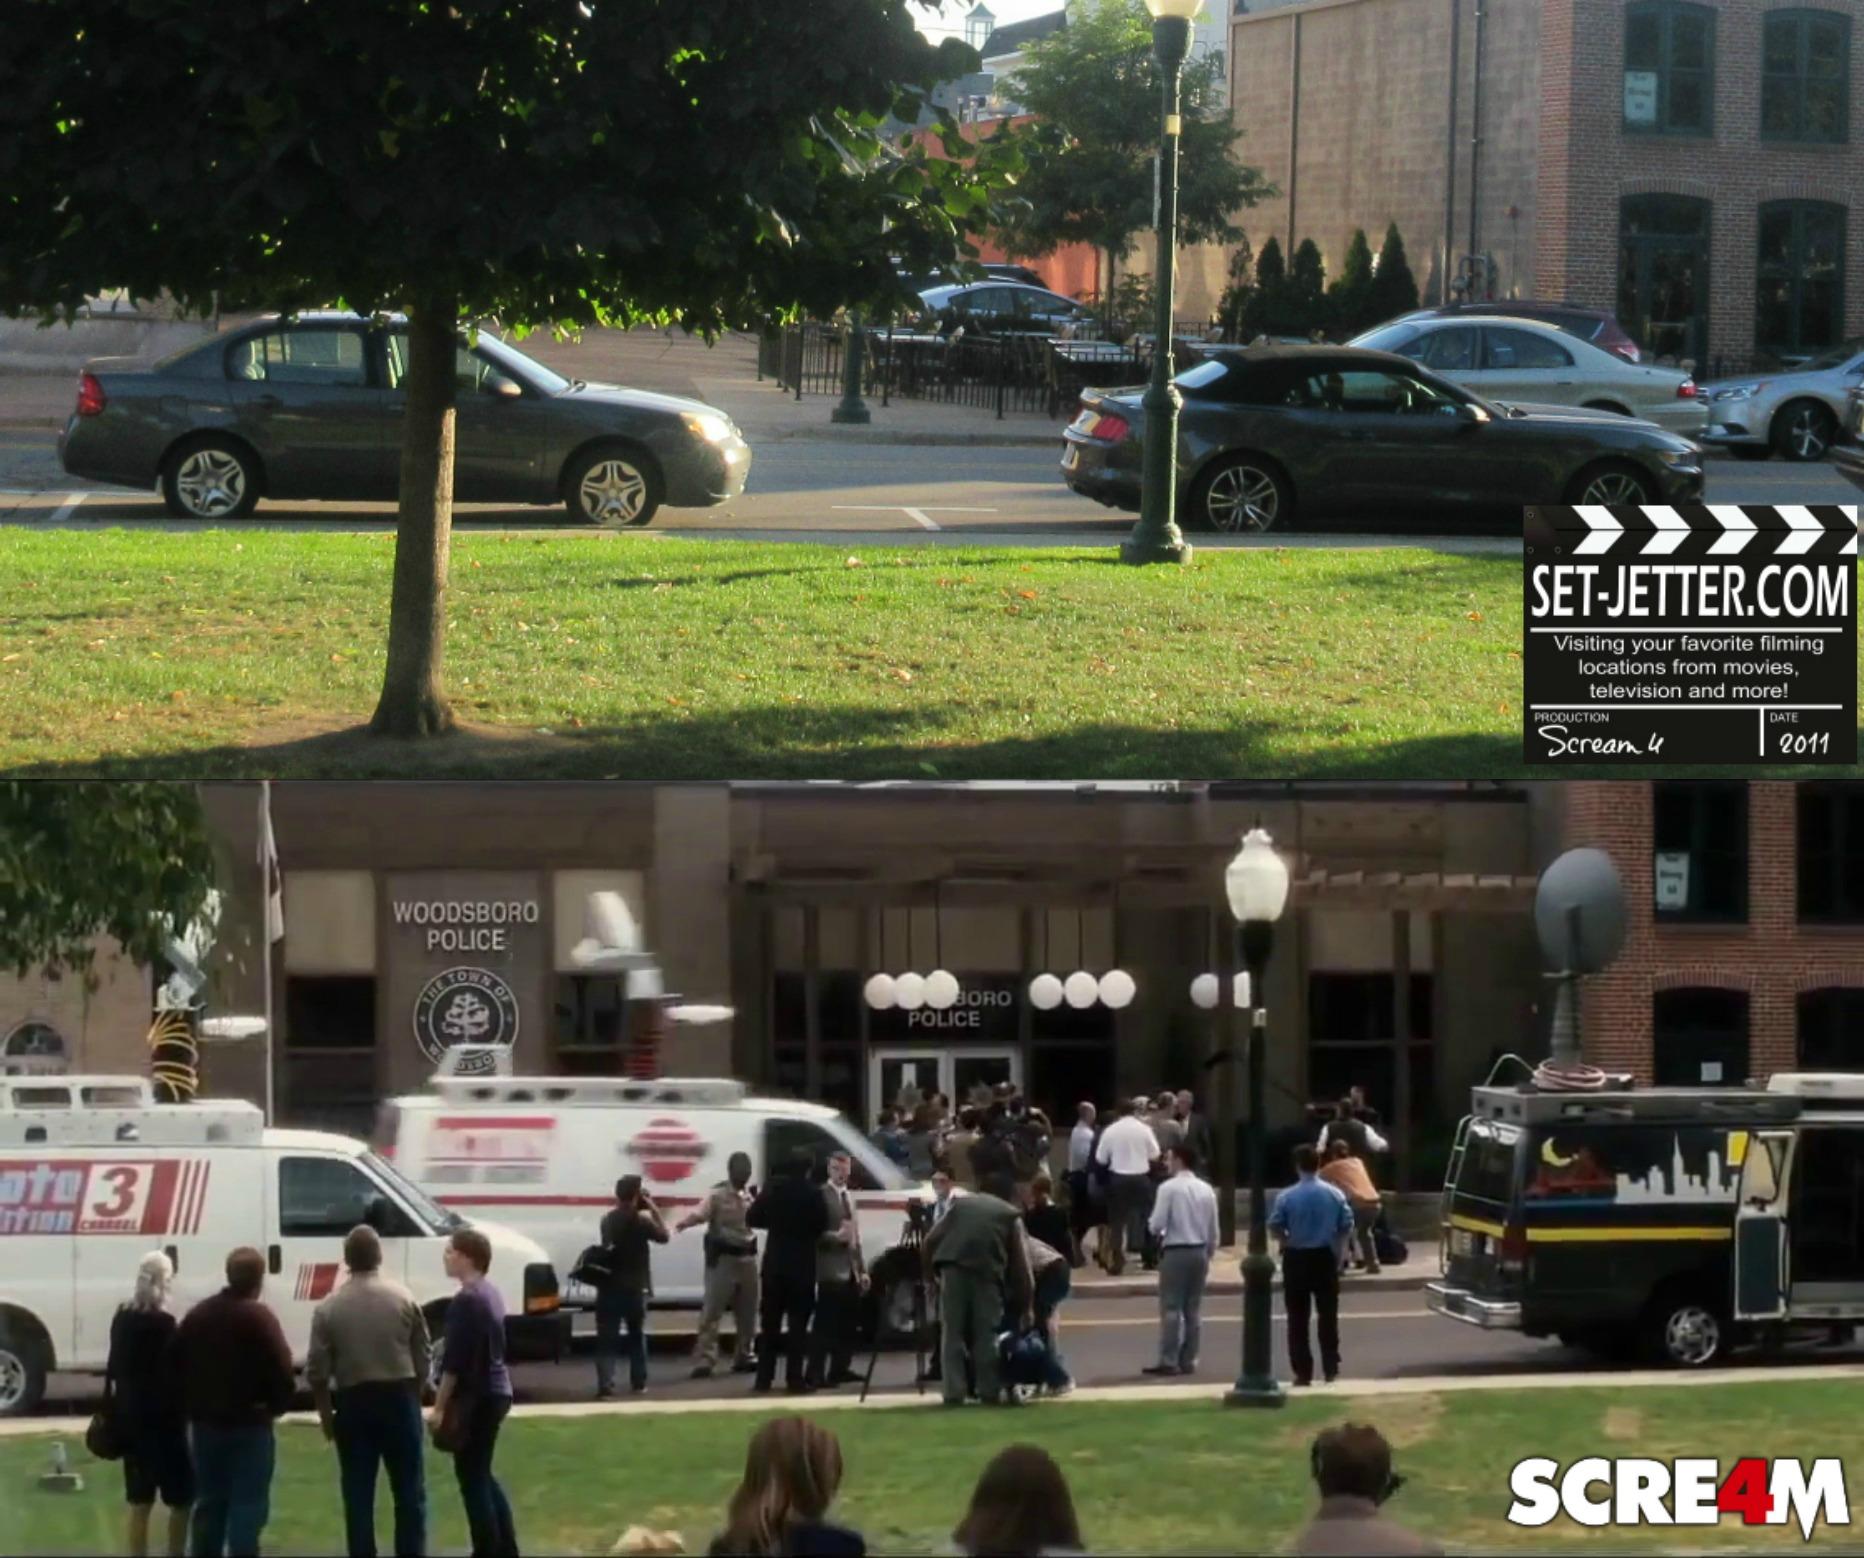 Scream4 comparison 150.jpg